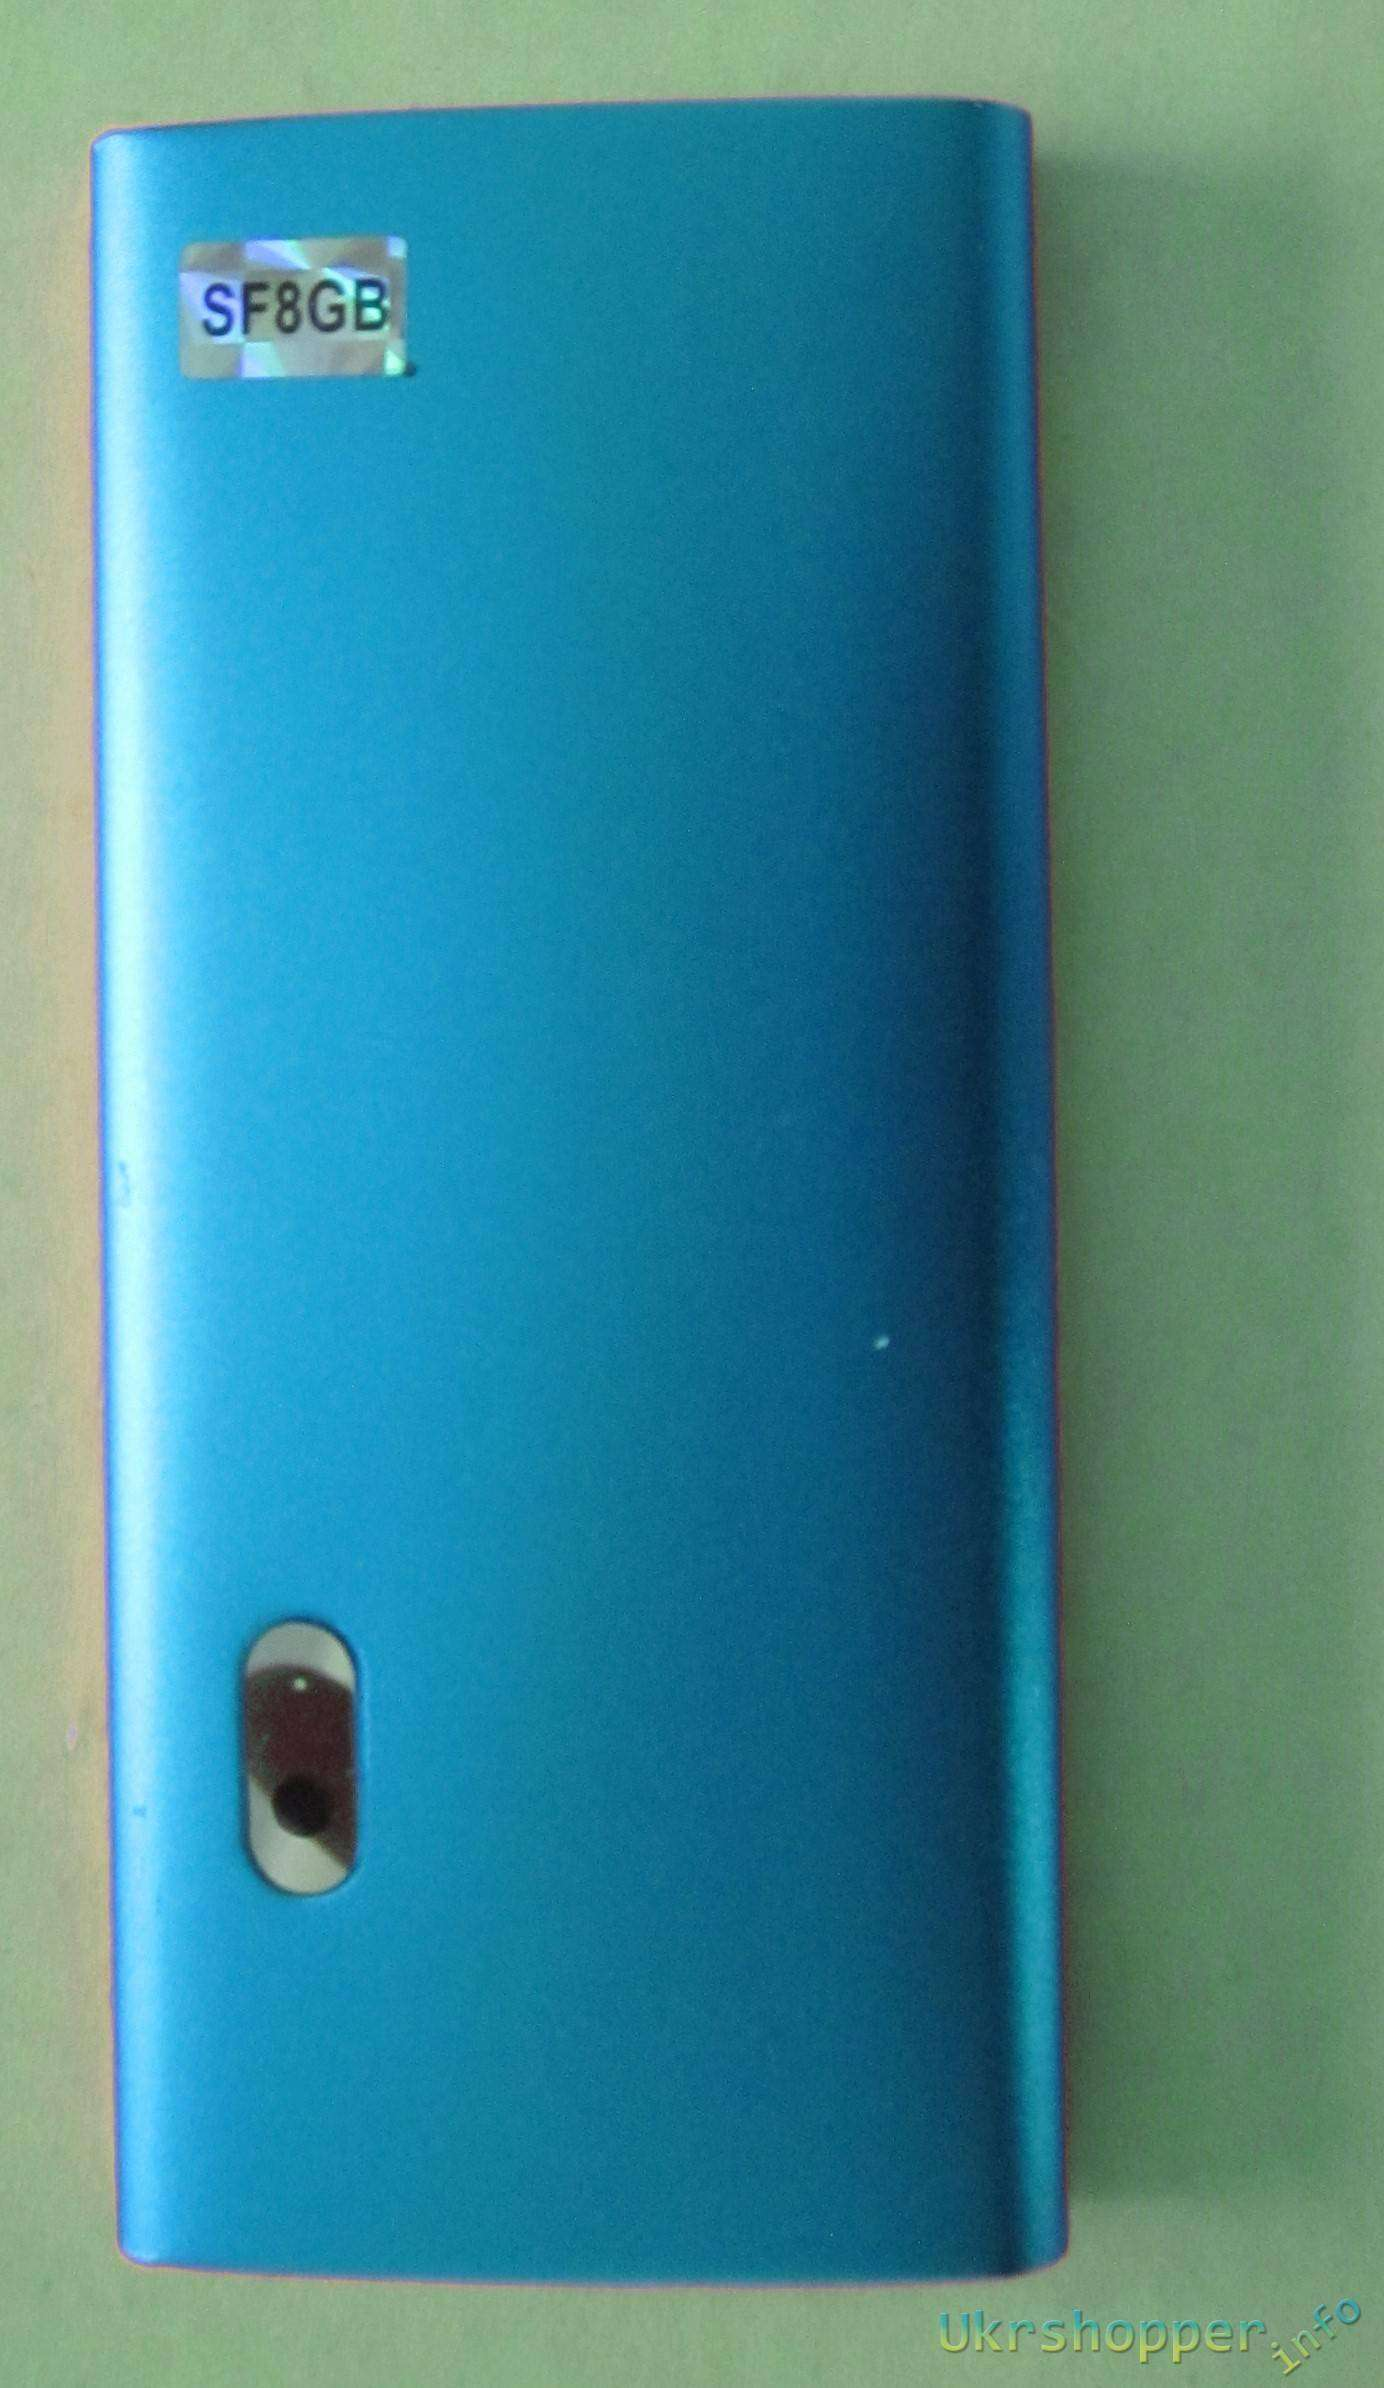 Aliexpress: Обзор MP4 плеера с 8Gb памяти на борту